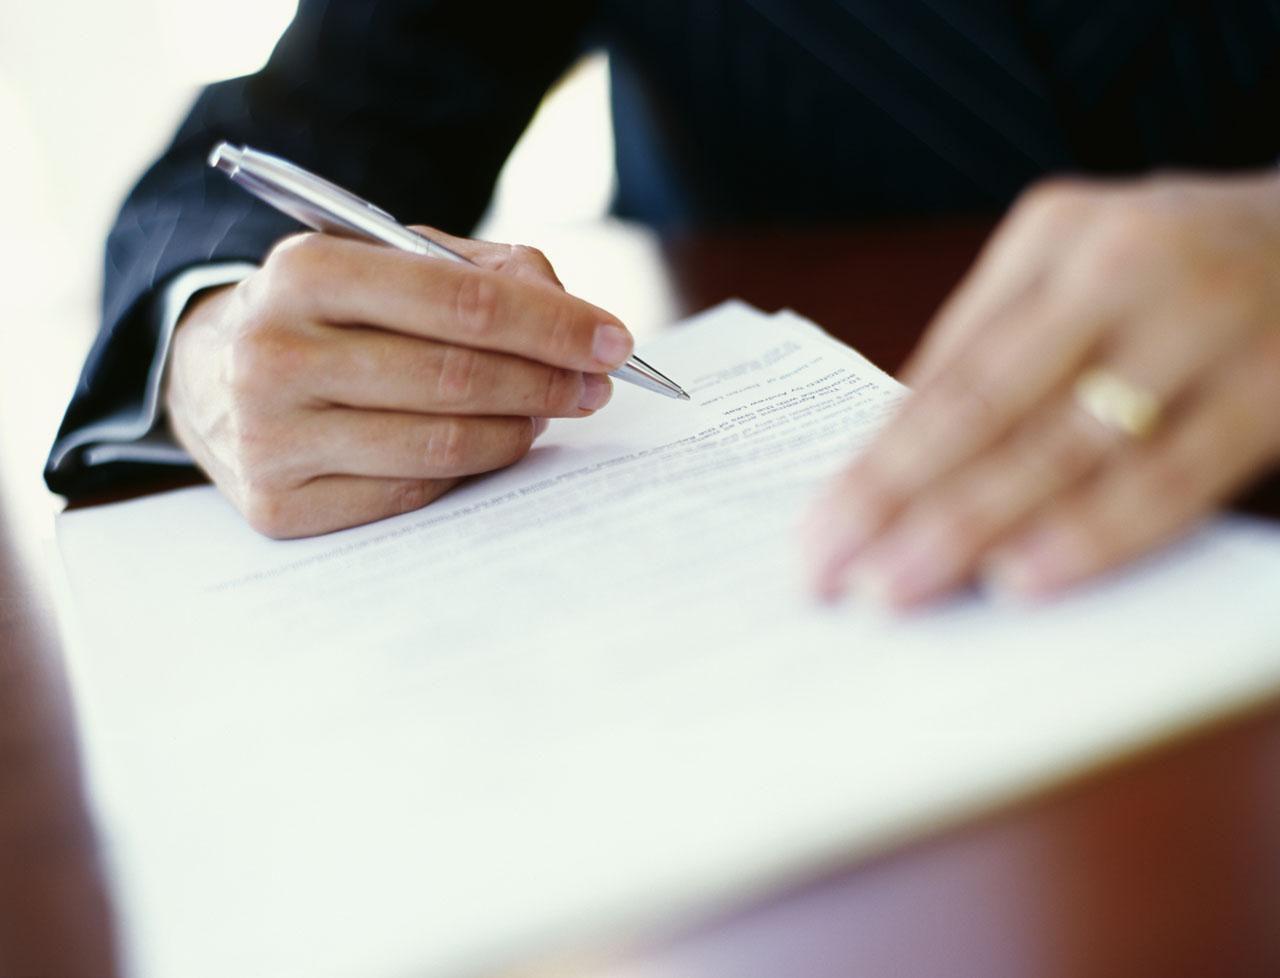 the proper business letter format